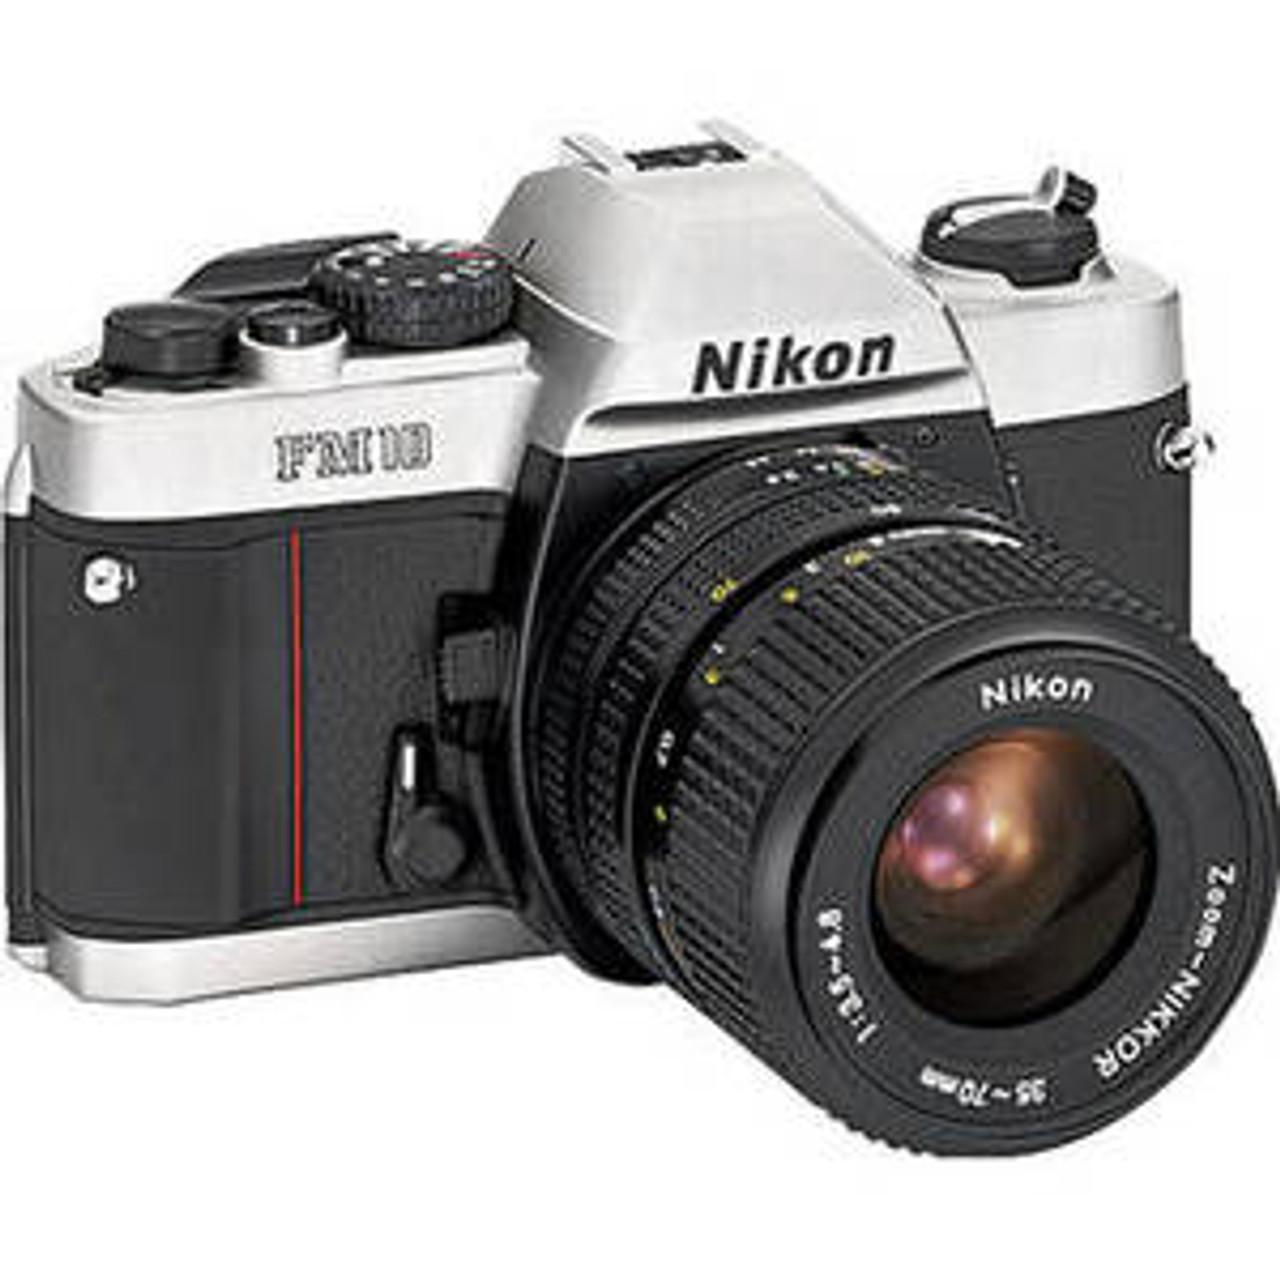 Nikon Fm10 35mm Slr Film Camera With 35 70mm Lens